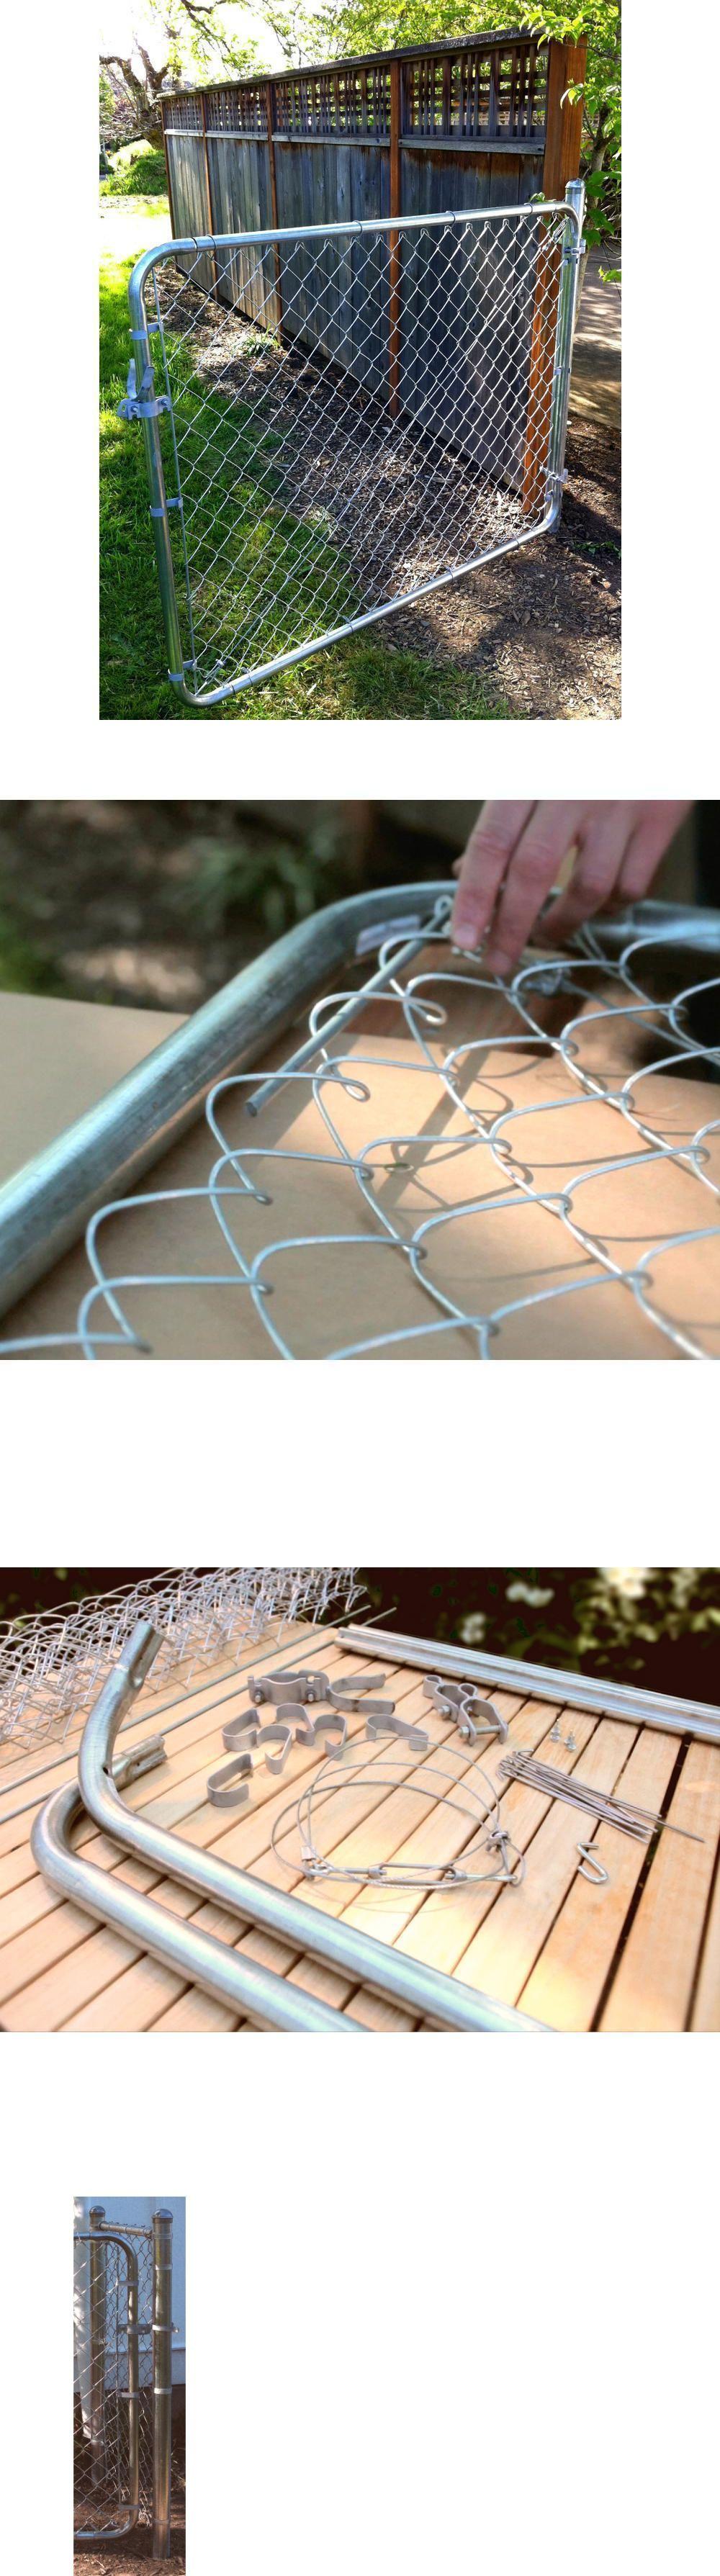 Heavy Duty Steel Adjustable Gate Walk Through Chain Link Dog Fence 6ft X 4ft Dog Fence Garden Gates Gate Kit